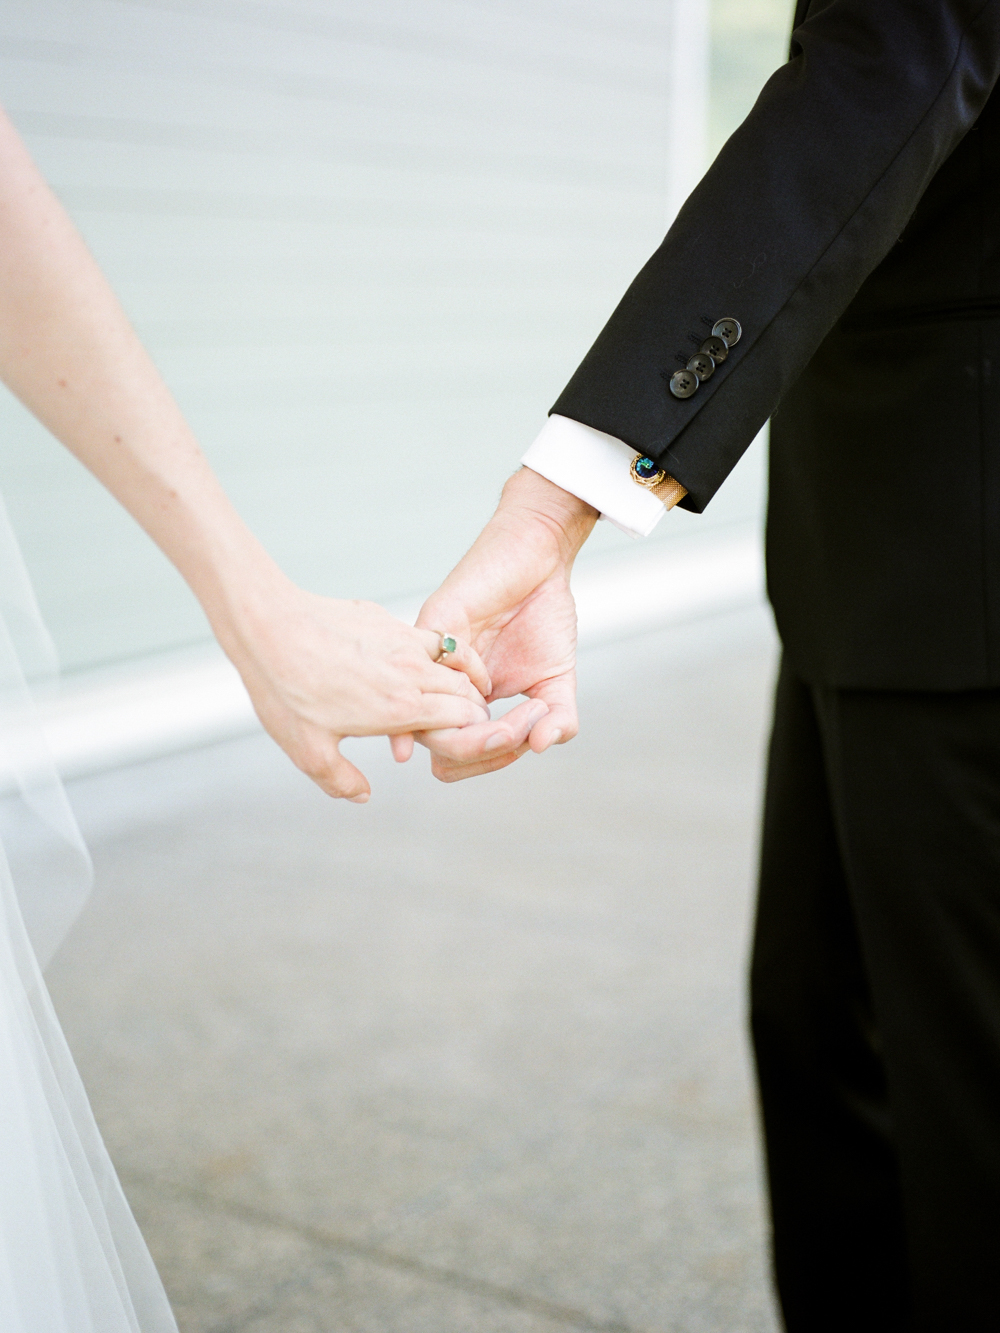 fall wedding at rothko chapel- houston wedding photographer-christine gosch - film photographer - elopement photographer- intimate wedding - lovely bride wedding gown-5.jpg